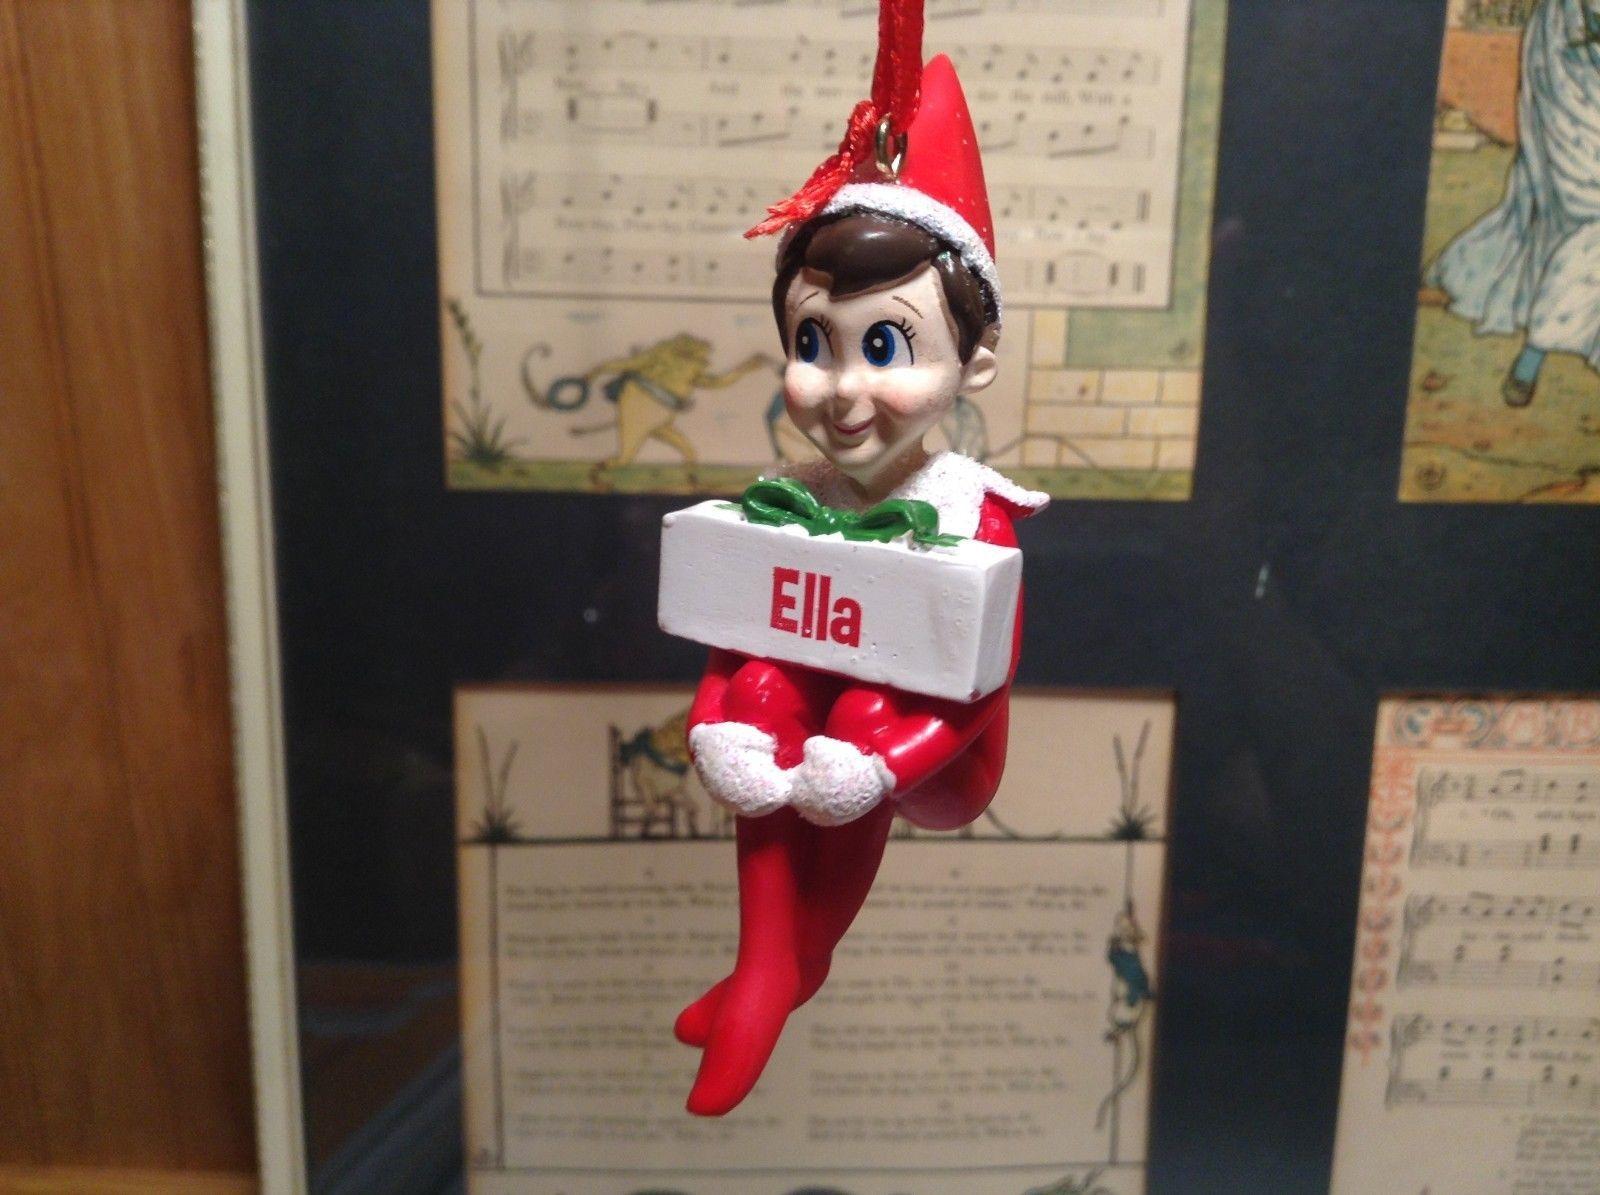 Dept 56 - Elf on the Shelf - Elf named Ella Christmas Ornament